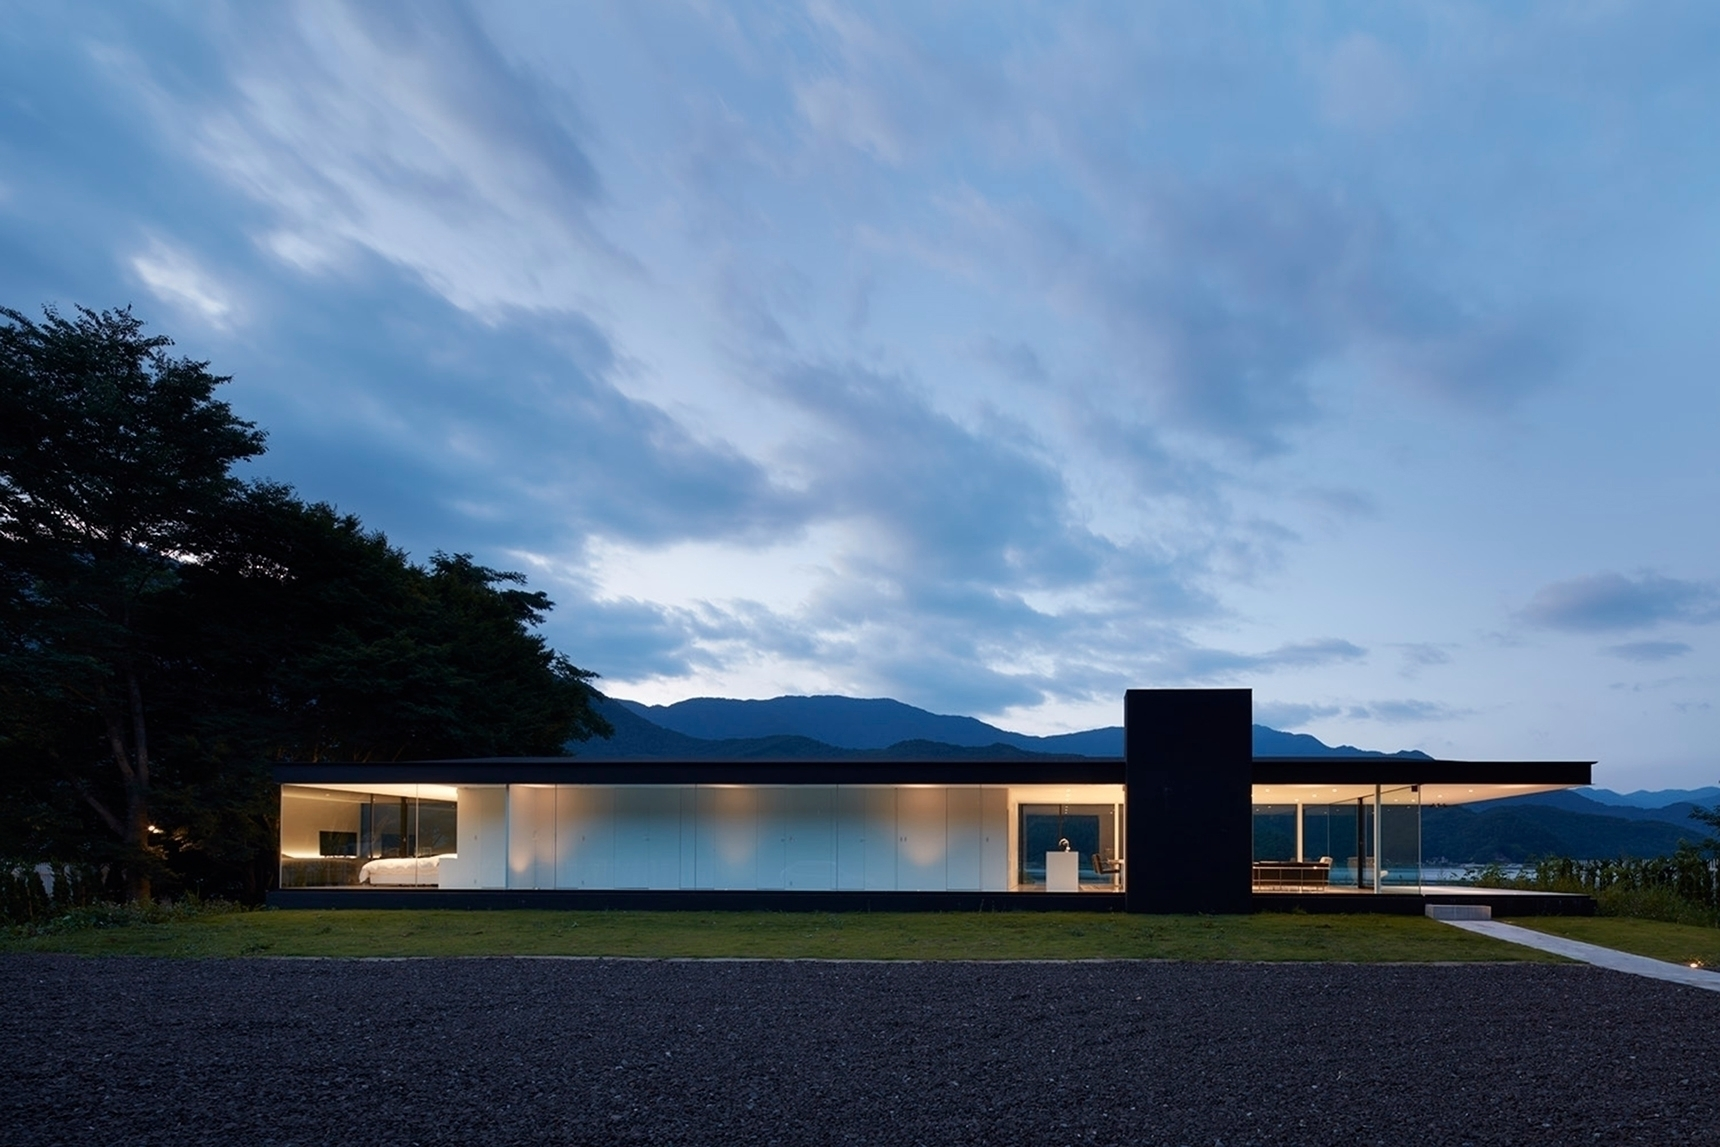 LAKESIDE HOUSE Shinichi Ogawa A - thetreemag | ello